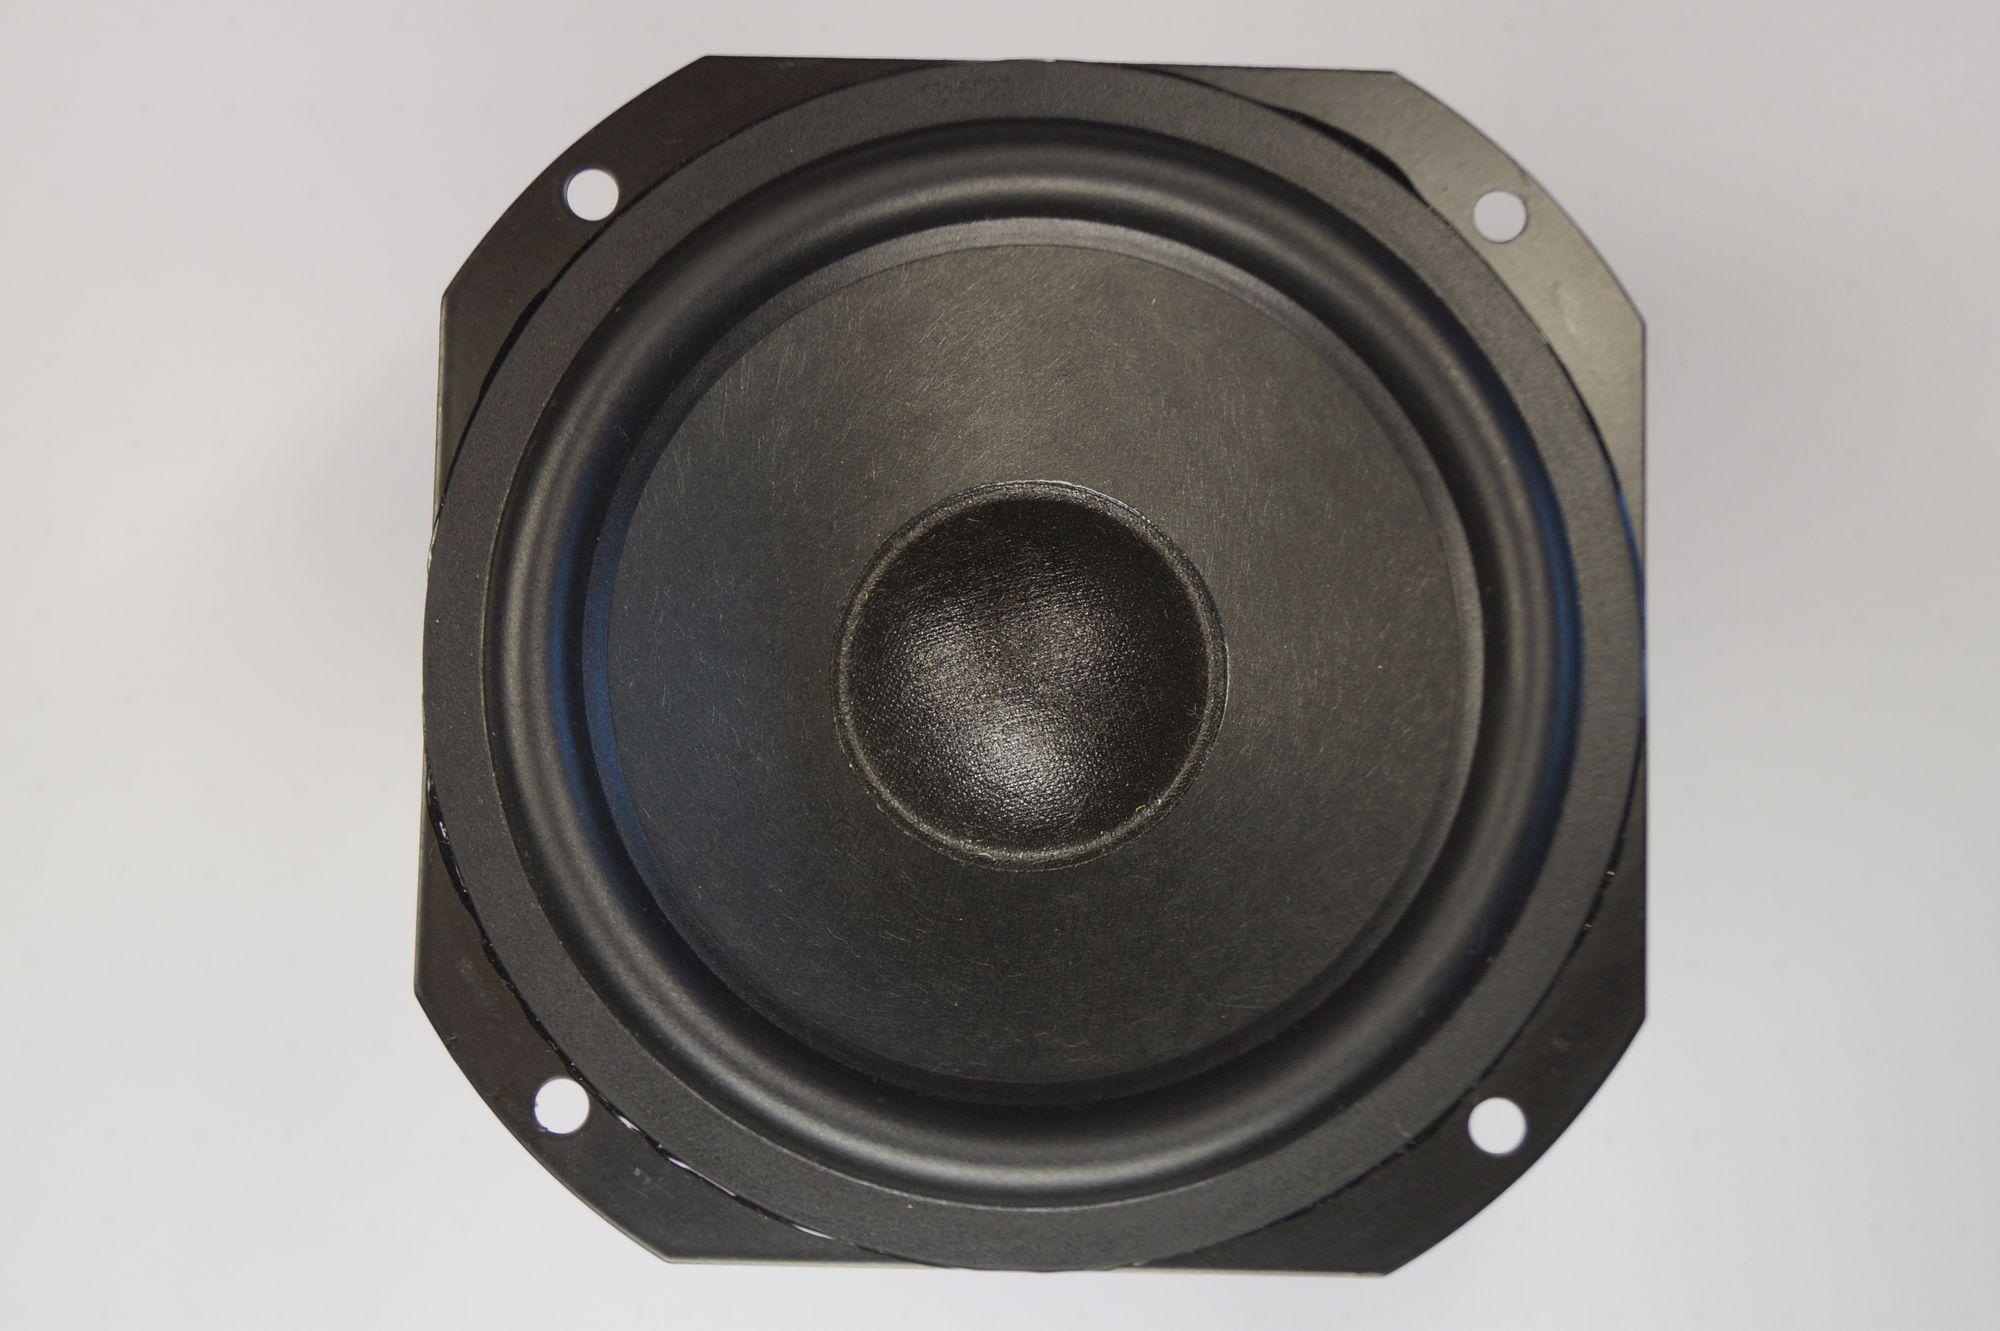 1 Stück Heco Victa 101 Tiefmitteltöner ,HW 120 S-KP 470 S , Serviceware – Bild 1